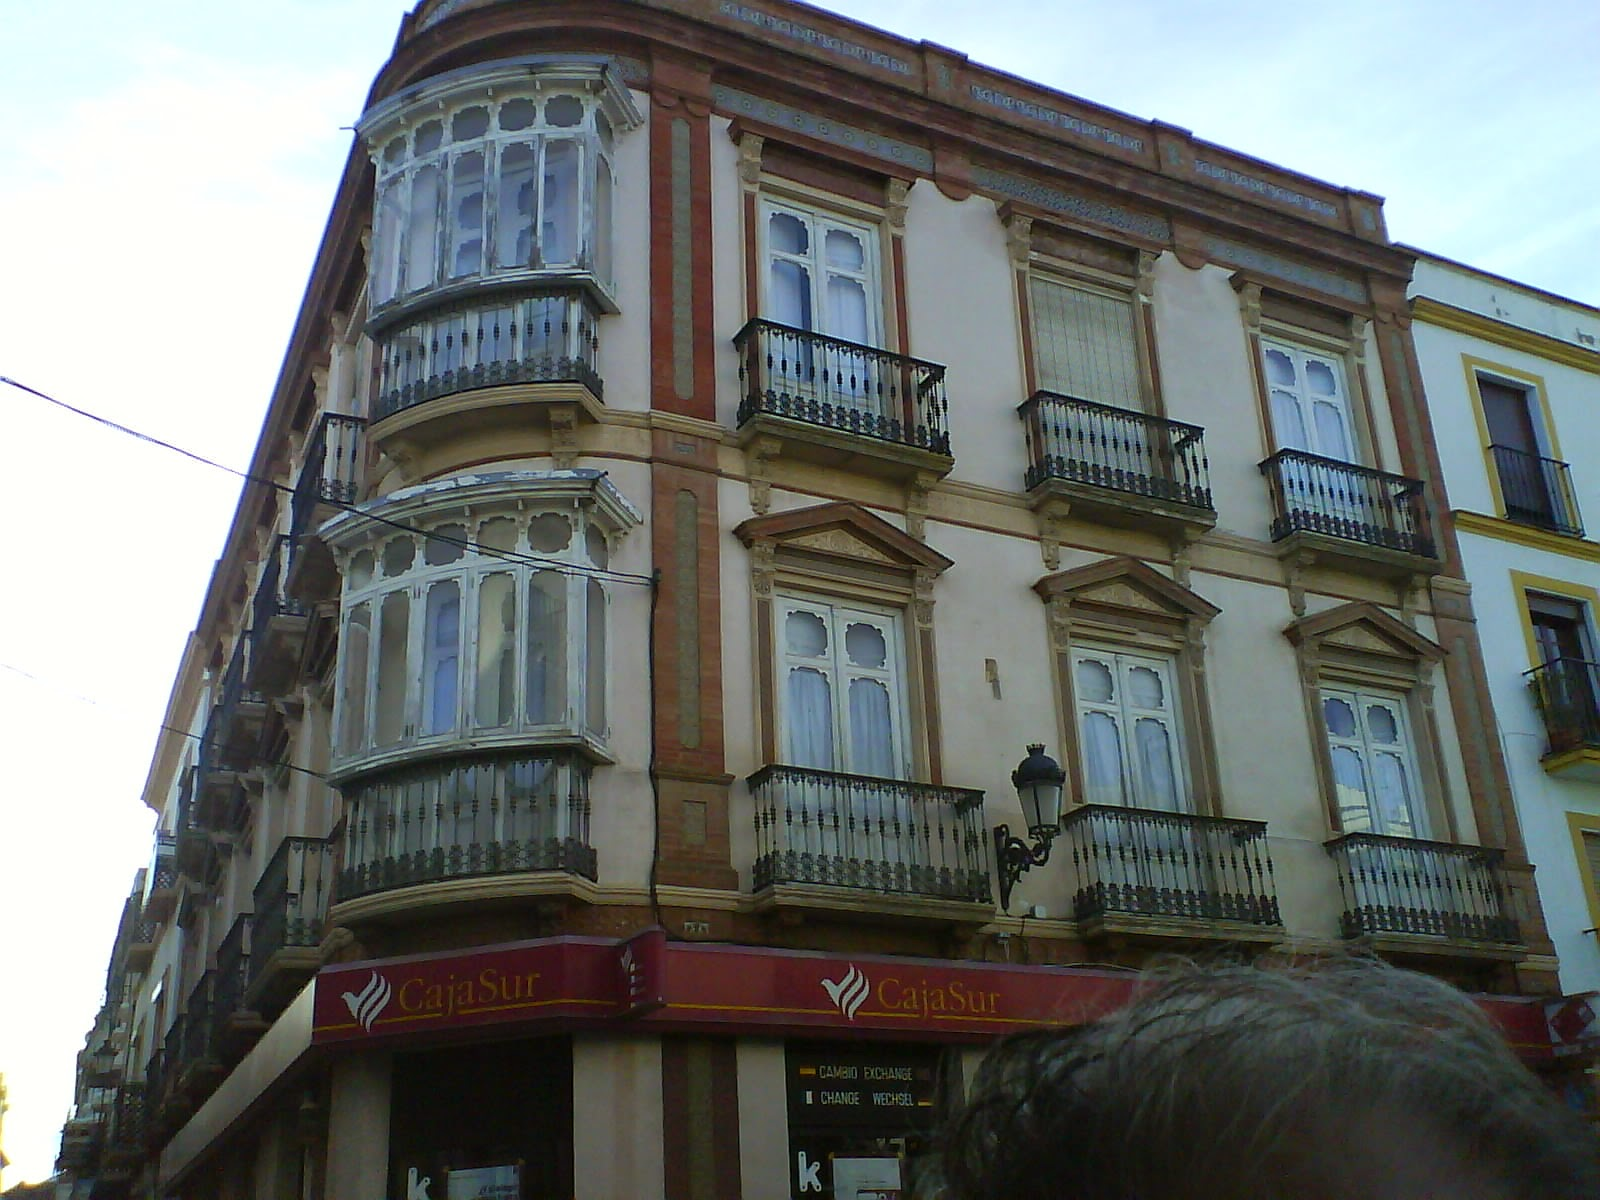 Paseo por la ronda modernista for Oficinas caja sur